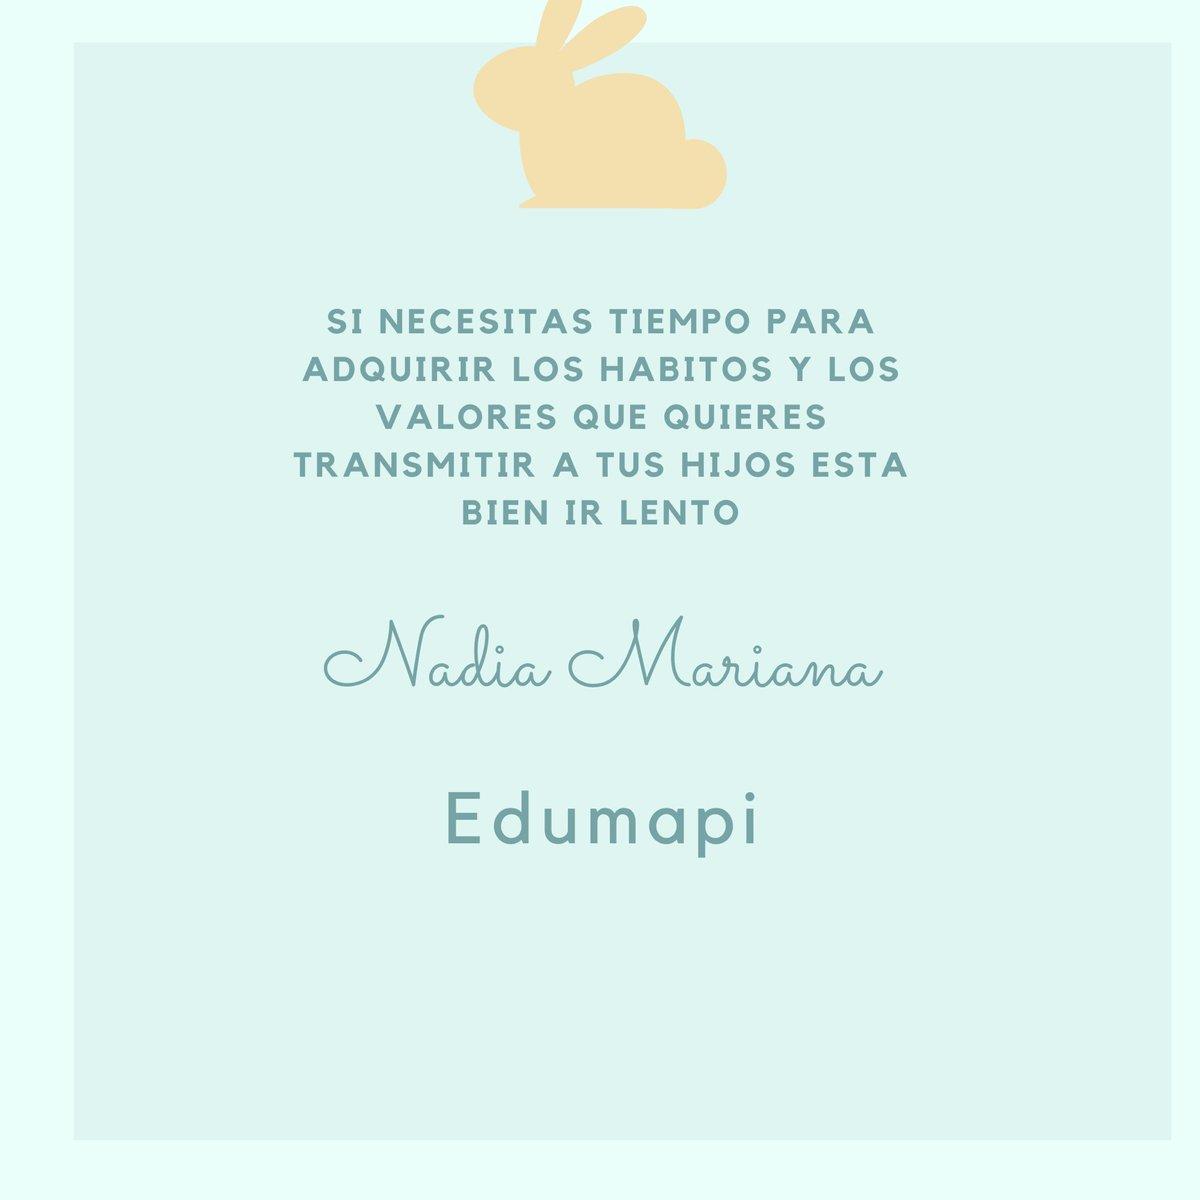 #maternidadreal, #parernidadreal, #paternidad, #mamá, #maternidad, #paternidadconsciente, #maternidadconsciente, #hogar, #hijos, #familia, #family, #familytimepic.twitter.com/PtssVF5wIa